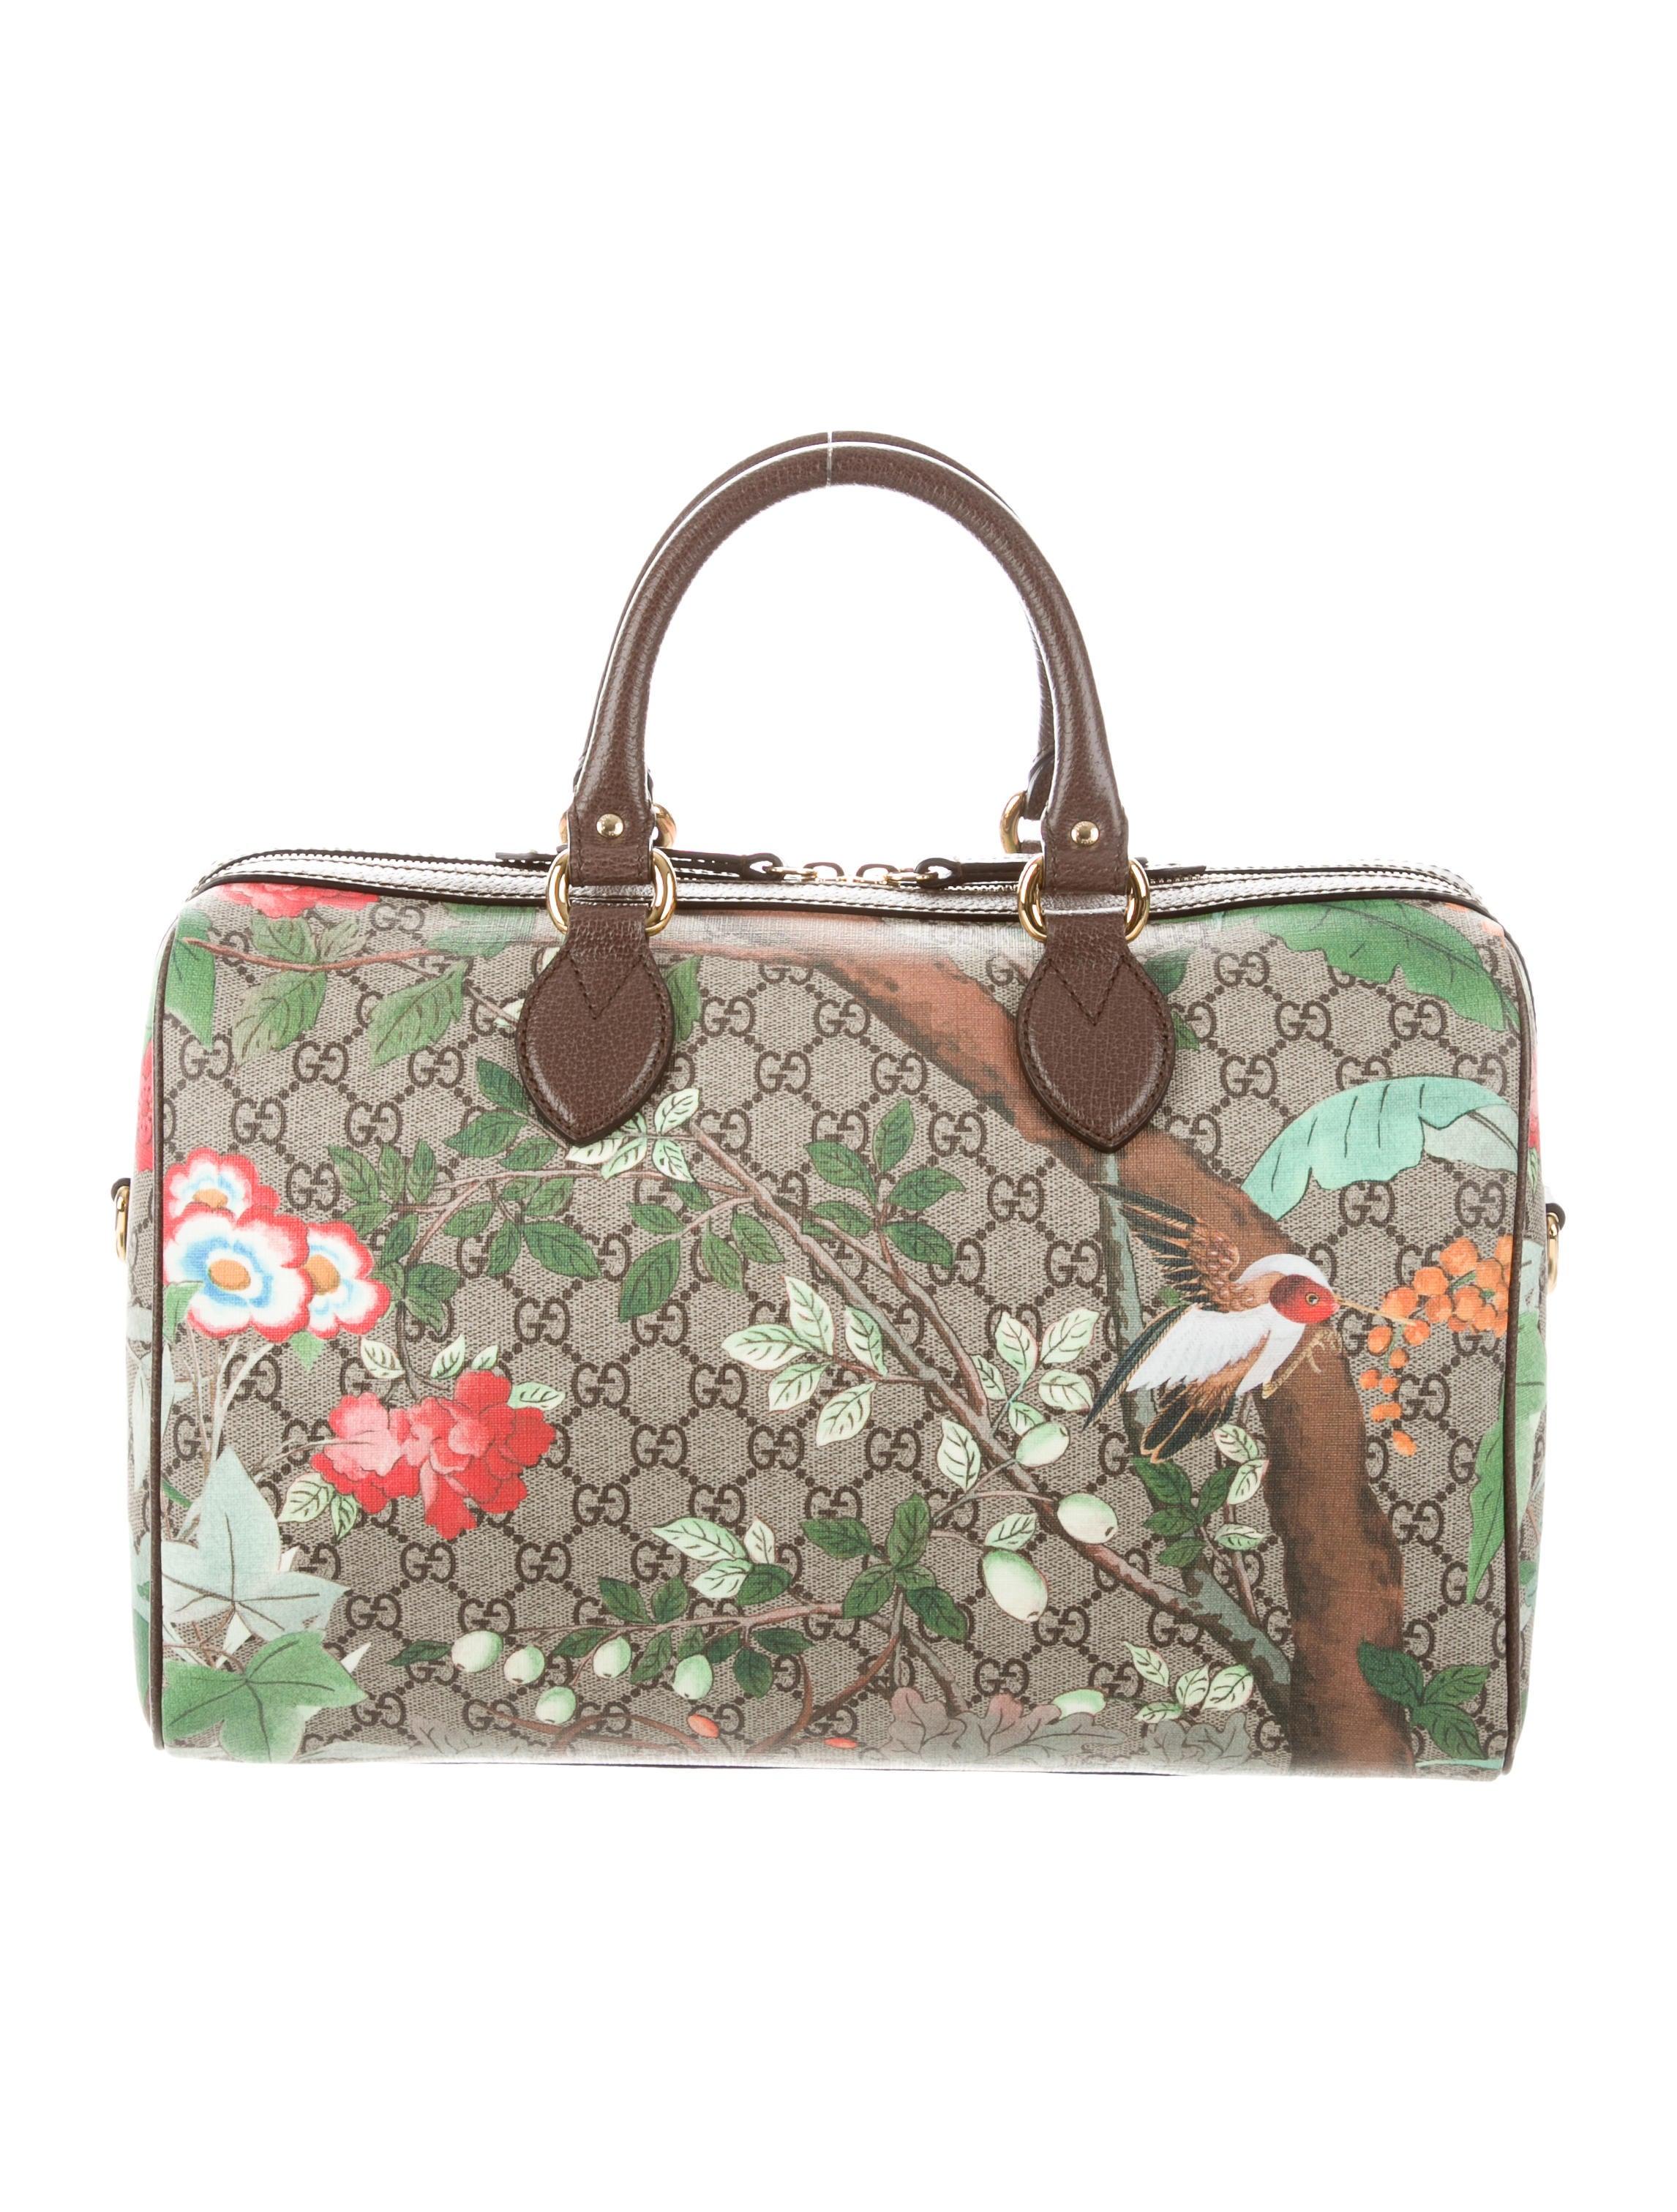 7ee55c236c7 Gucci Tian GG Supreme Boston Bag - Handbags - GUC251456